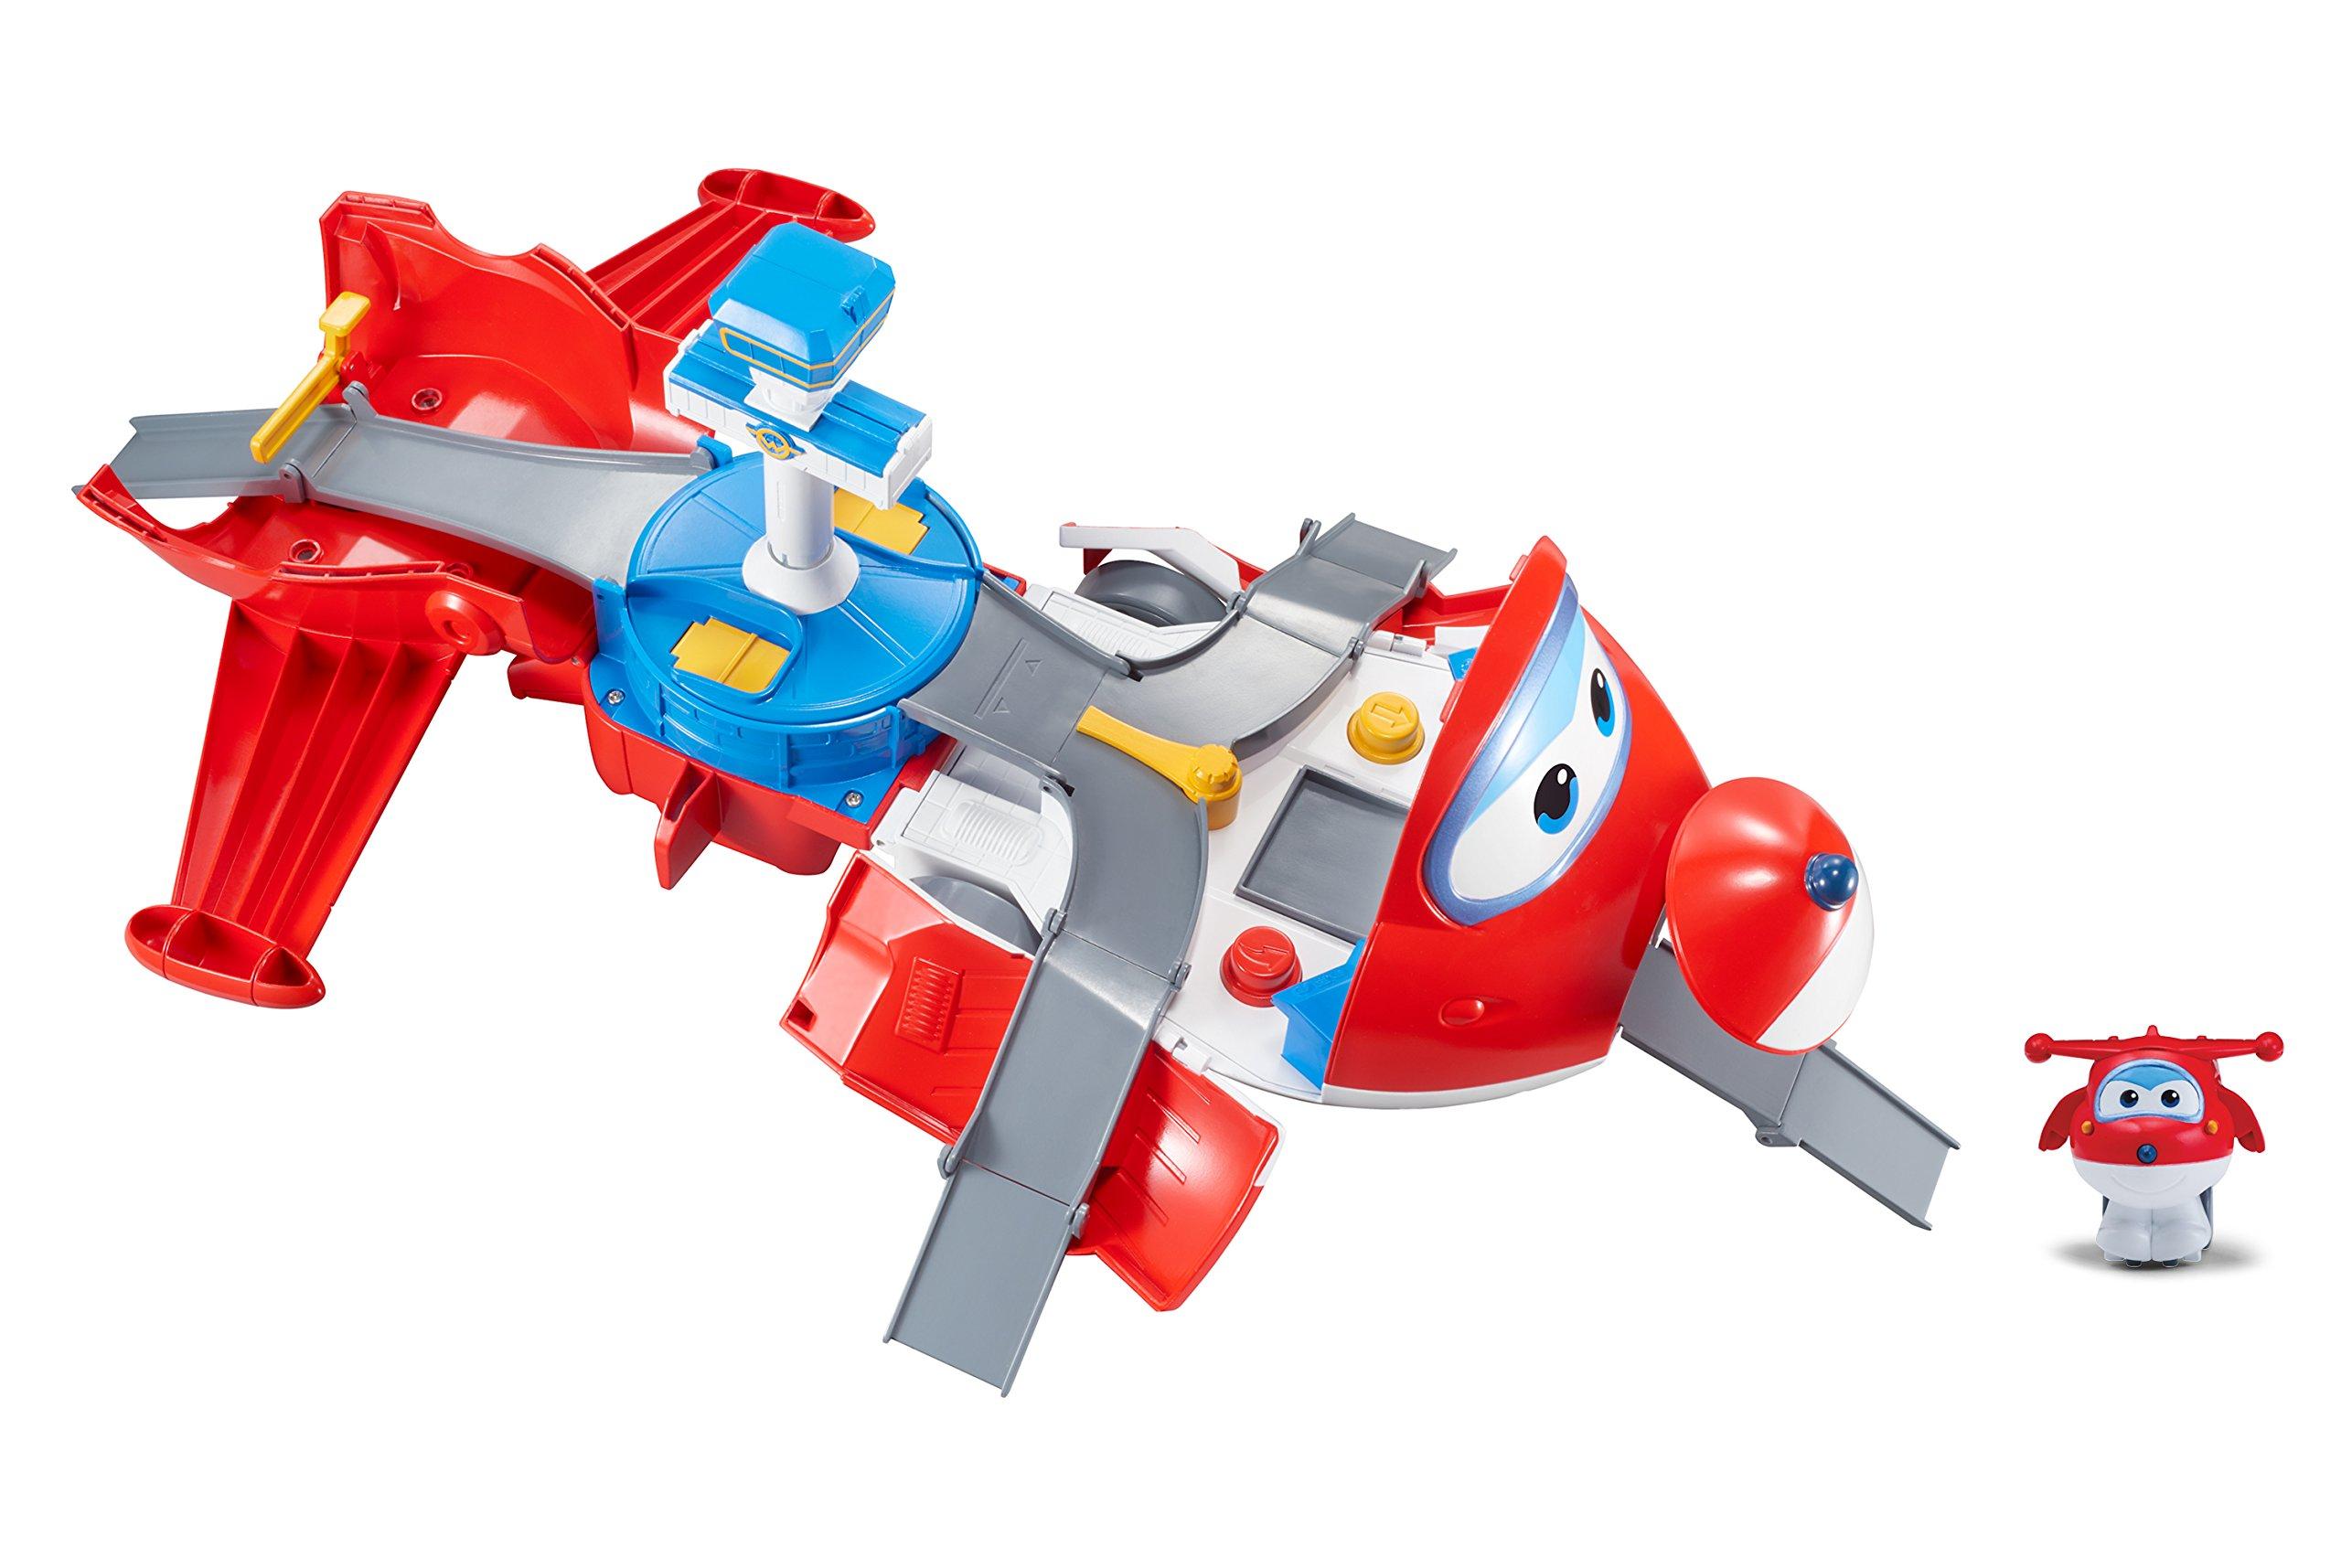 Super Wings - Jett's Takeoff Tower 2-in-1 Toy Playset | Includes Jett Figure | Pop 'n Transform Scale by Super Wings -